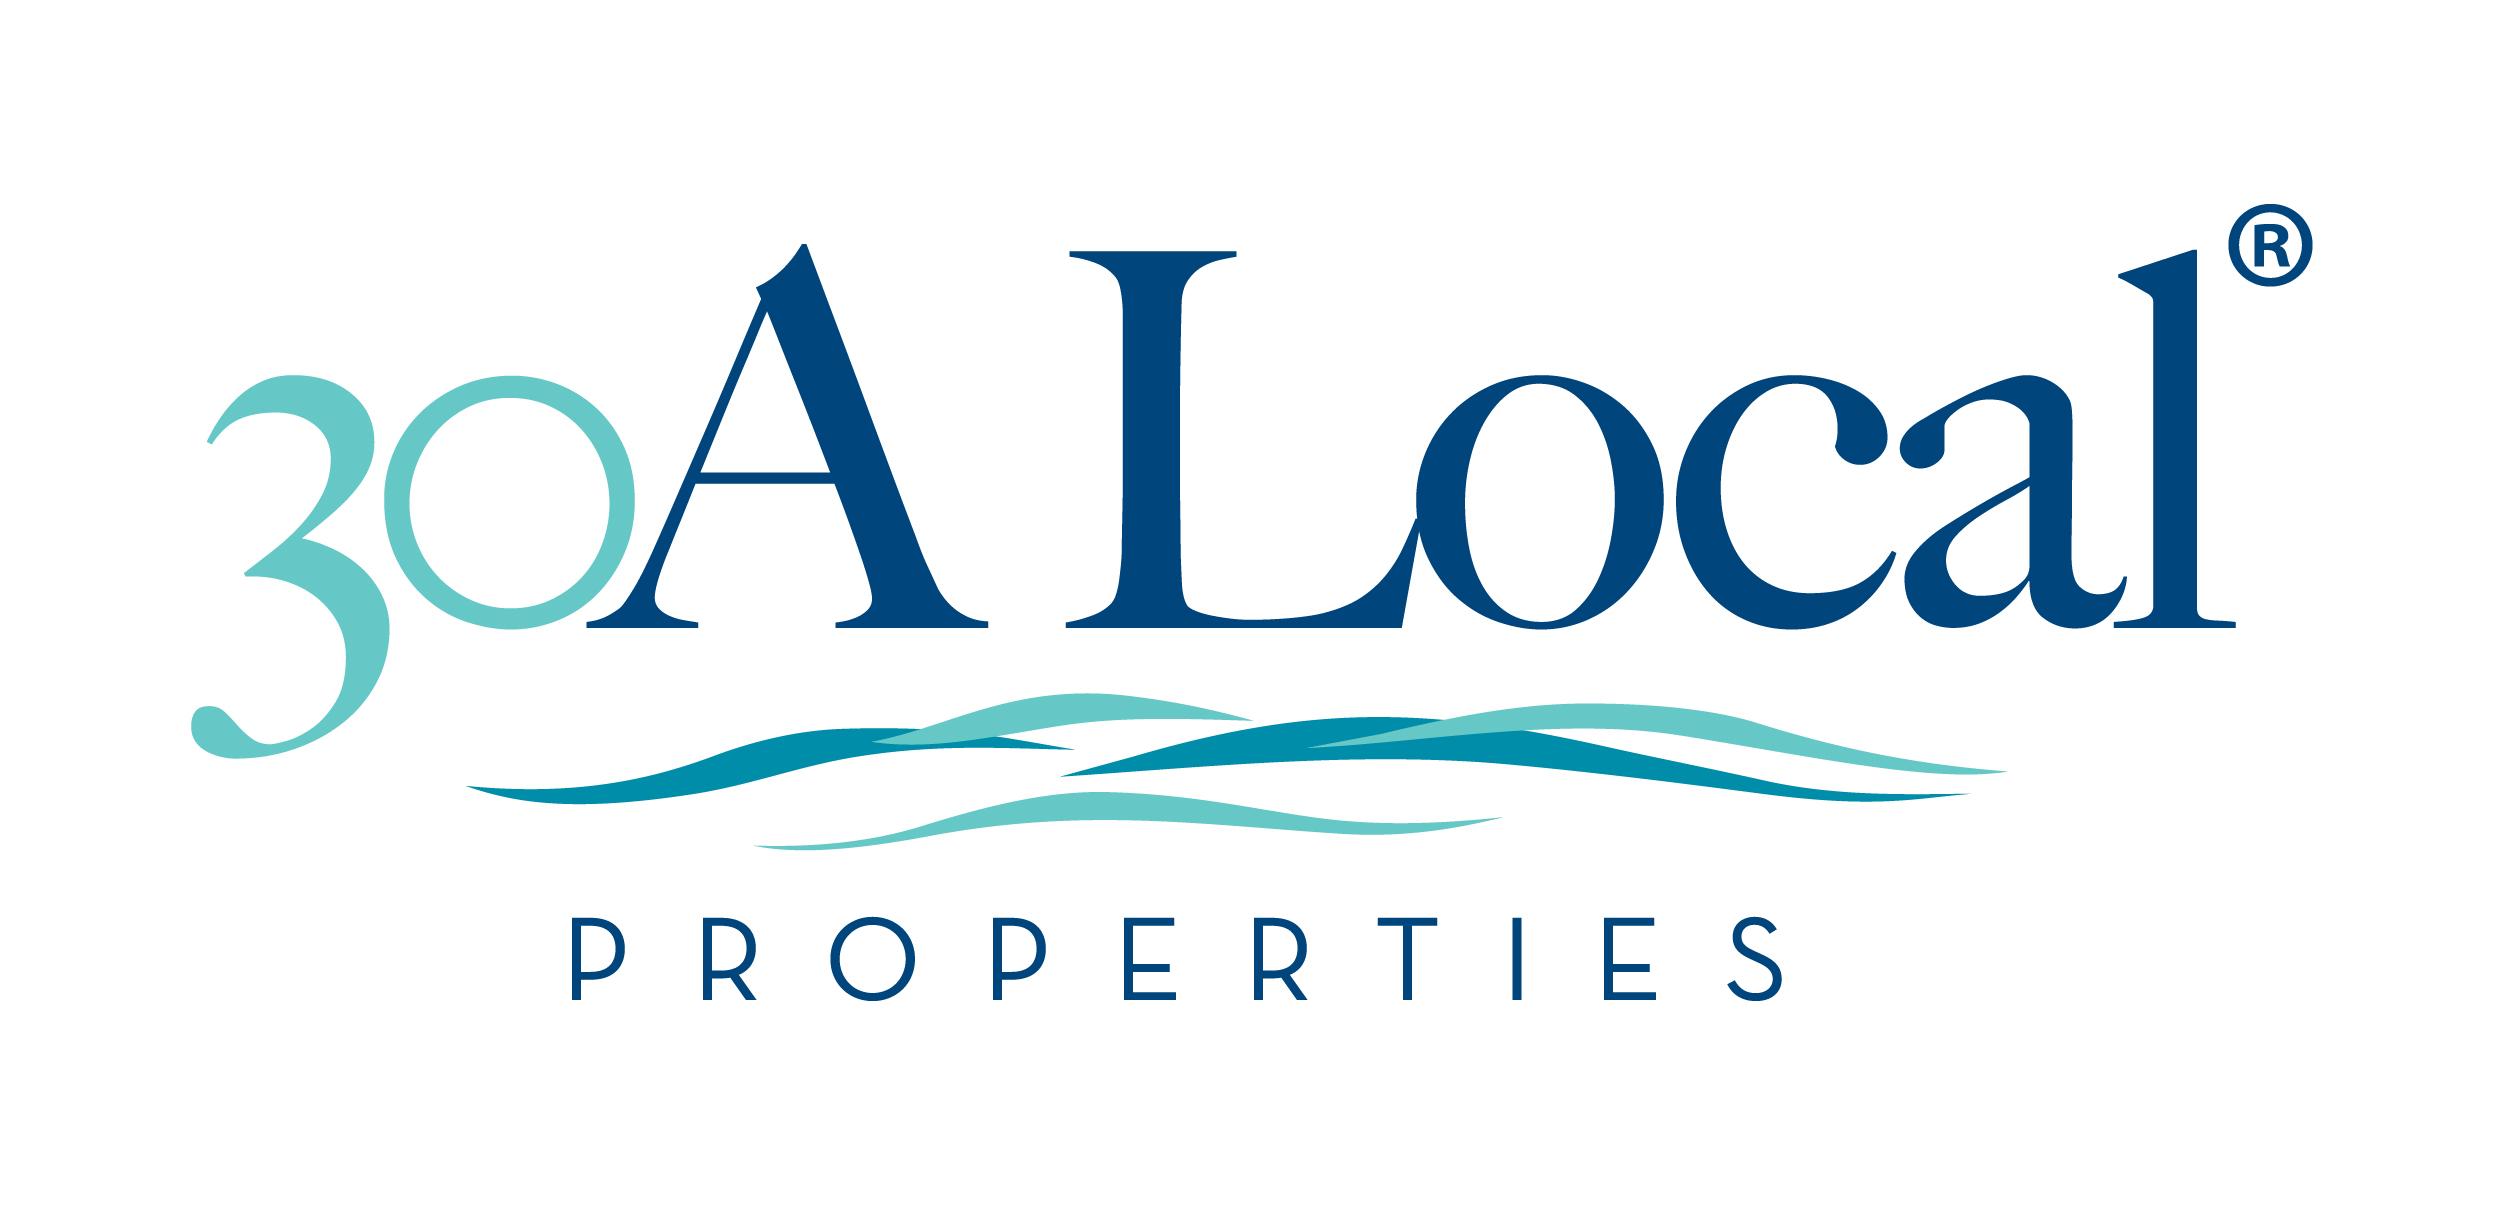 30Alocal_logo_2016_large.jpg